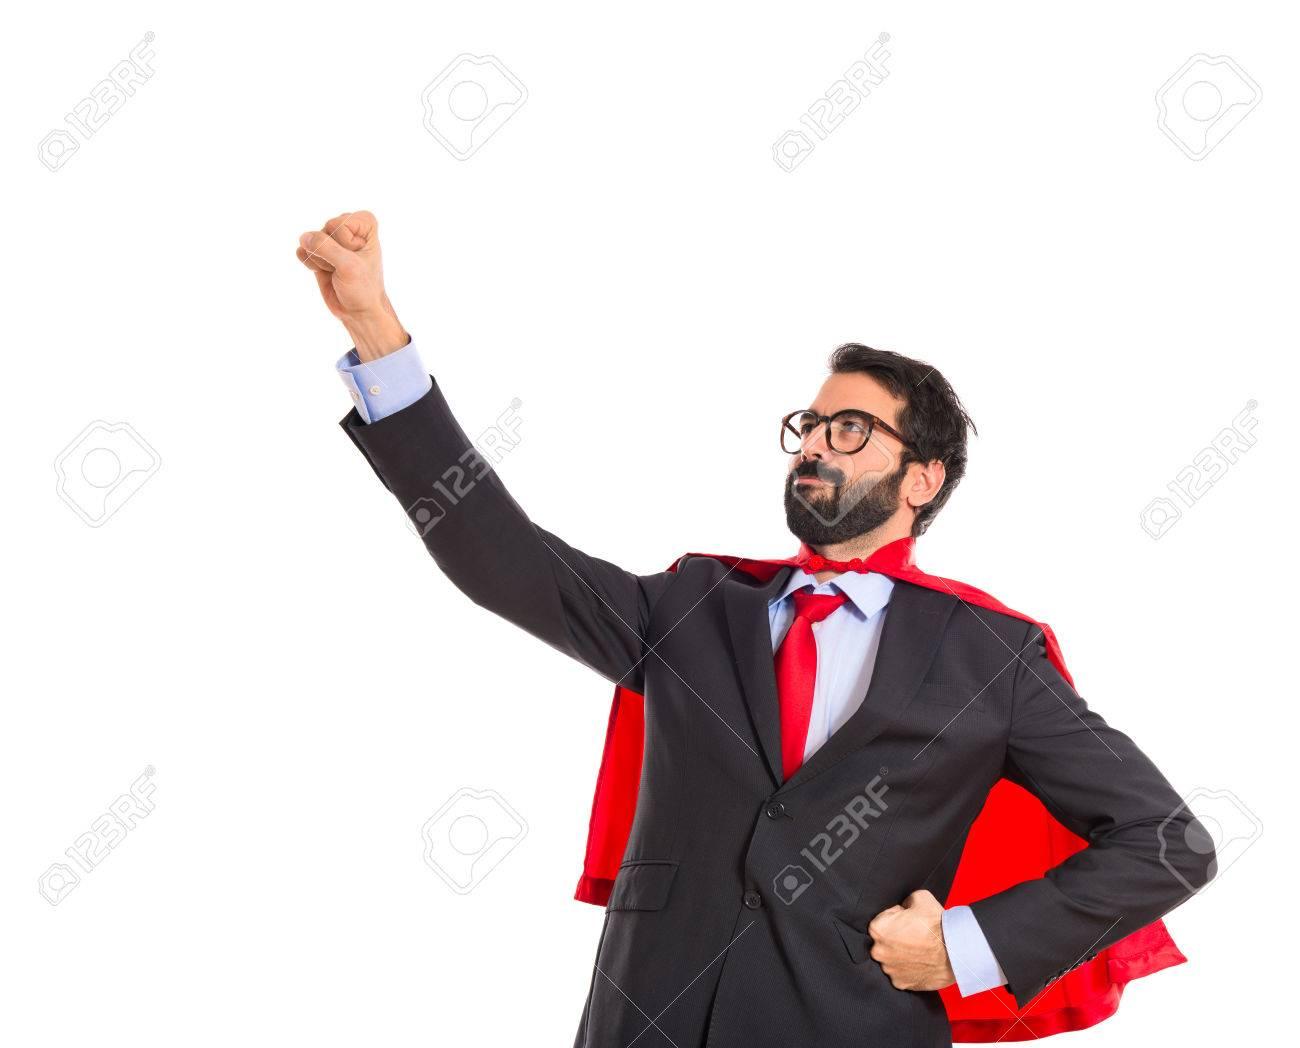 Businessman dressed like superhero Stock Photo - 33542599